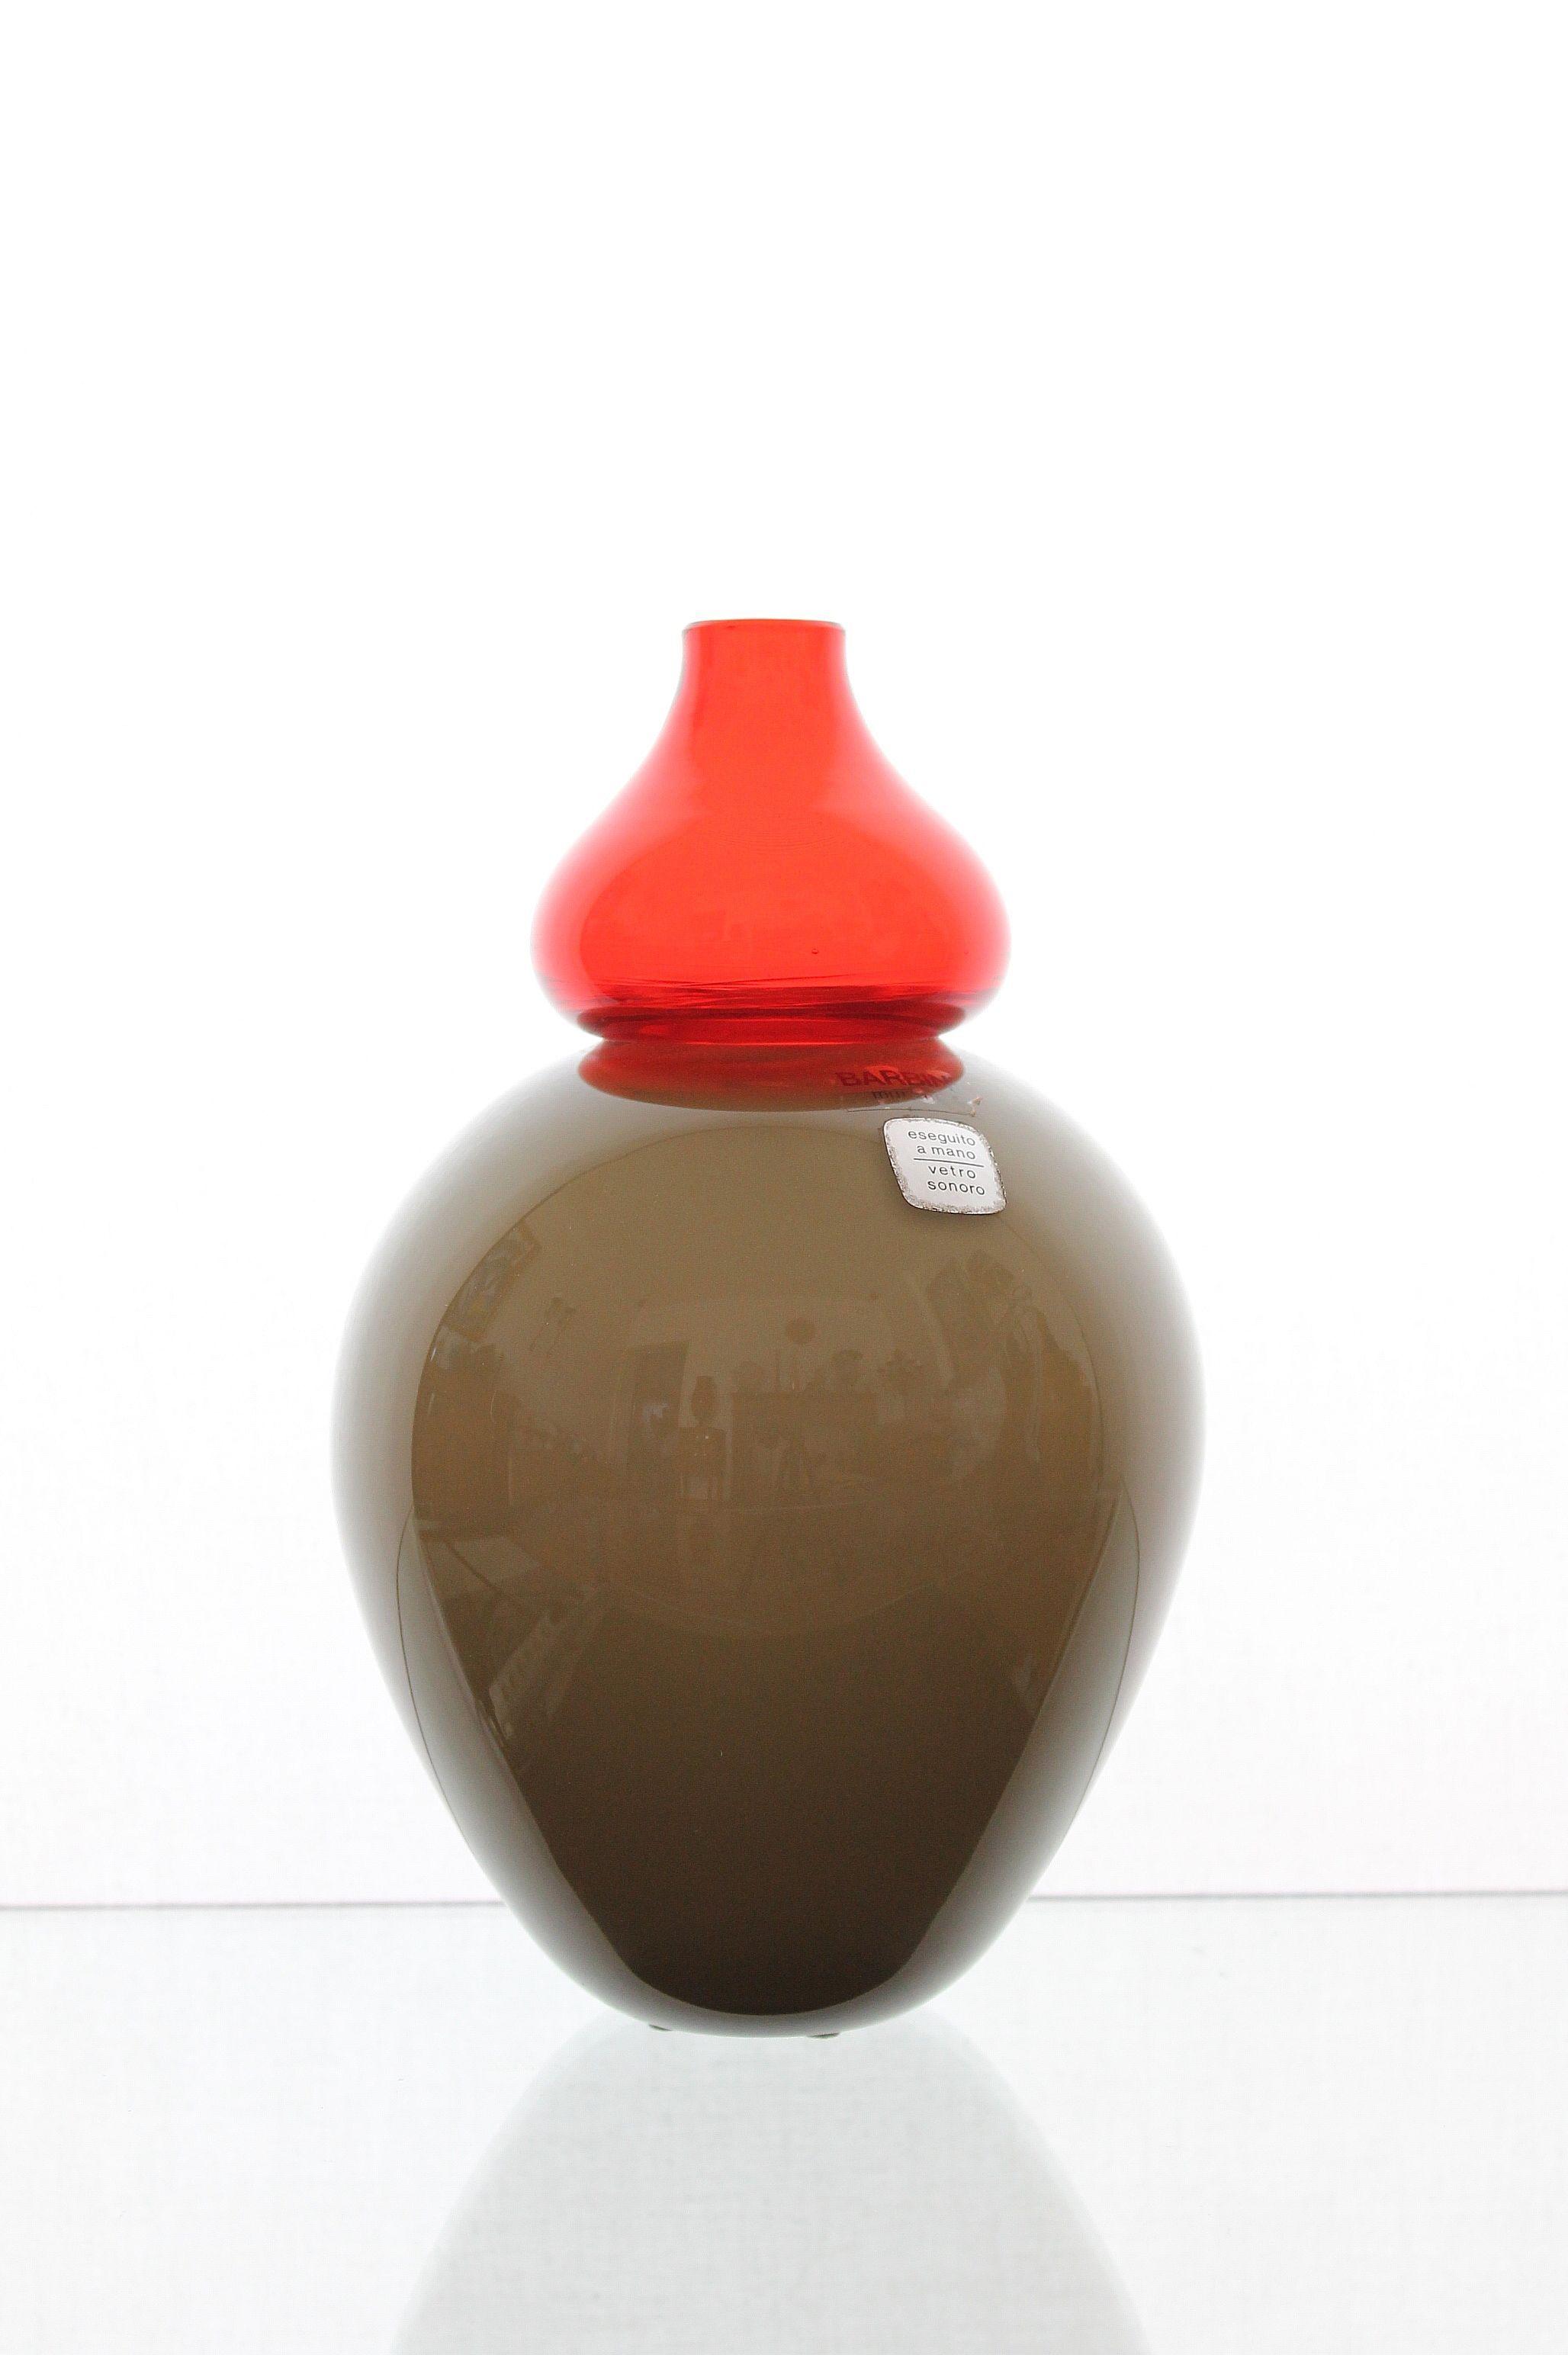 "Alfredo Barbini, Murano Art Glass Vase ""Orientale"". For more information: http://tillipan.com/alfredo-barbini-vase/barbini-murano-2/"